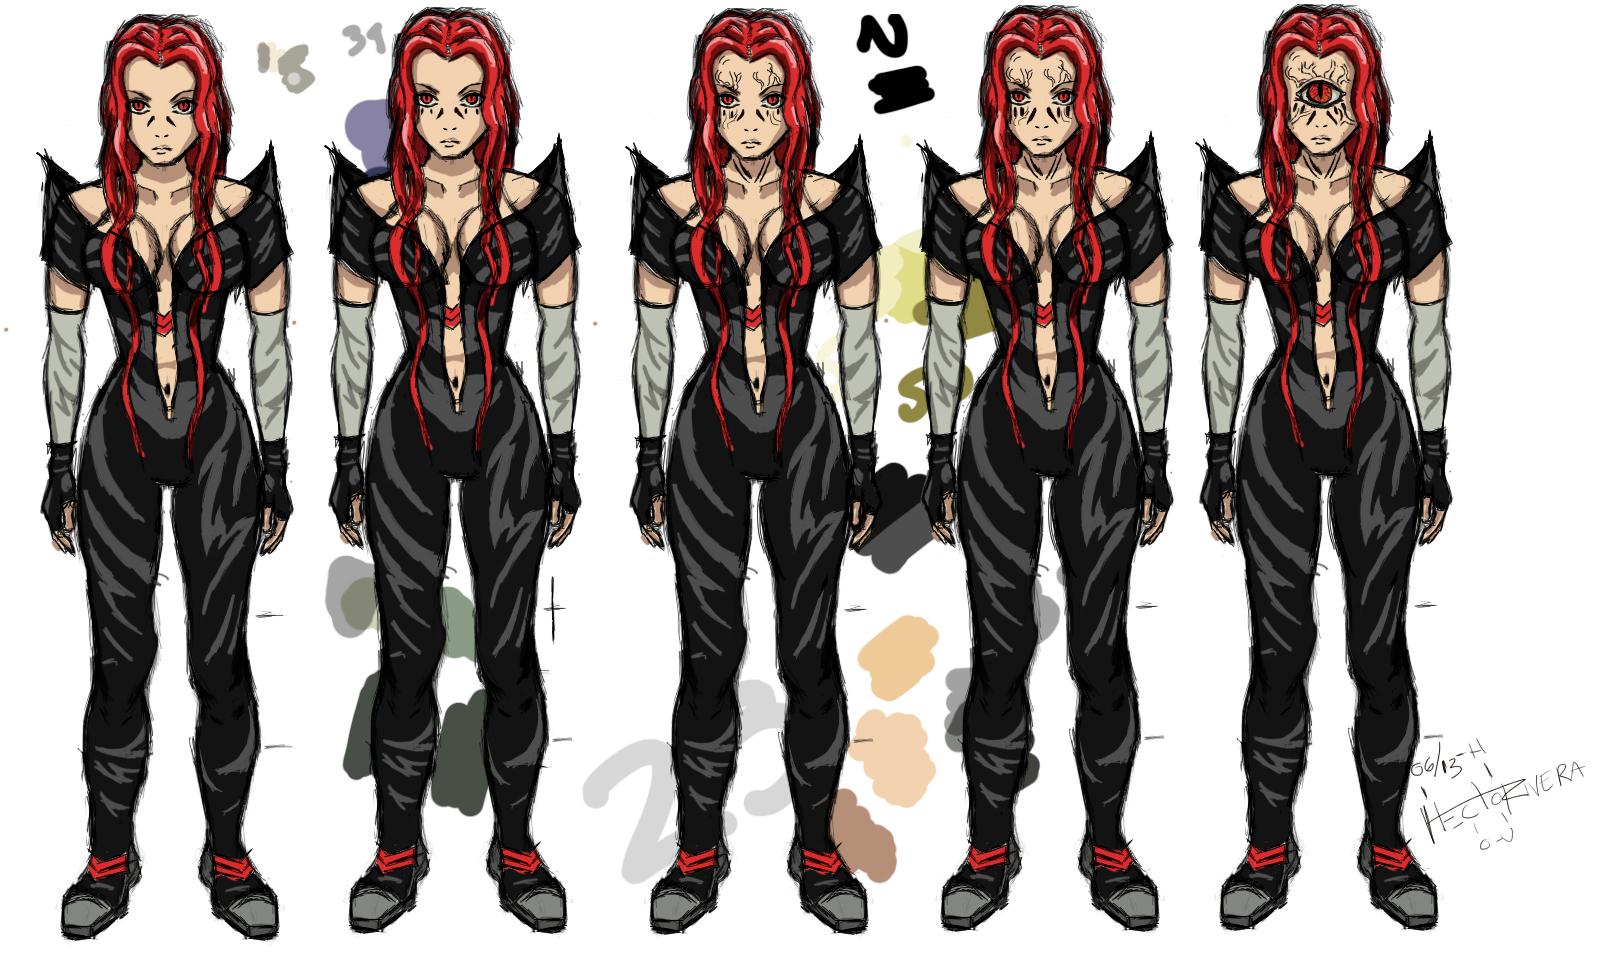 Character Design Oc : Cartoon character design by itzaspace